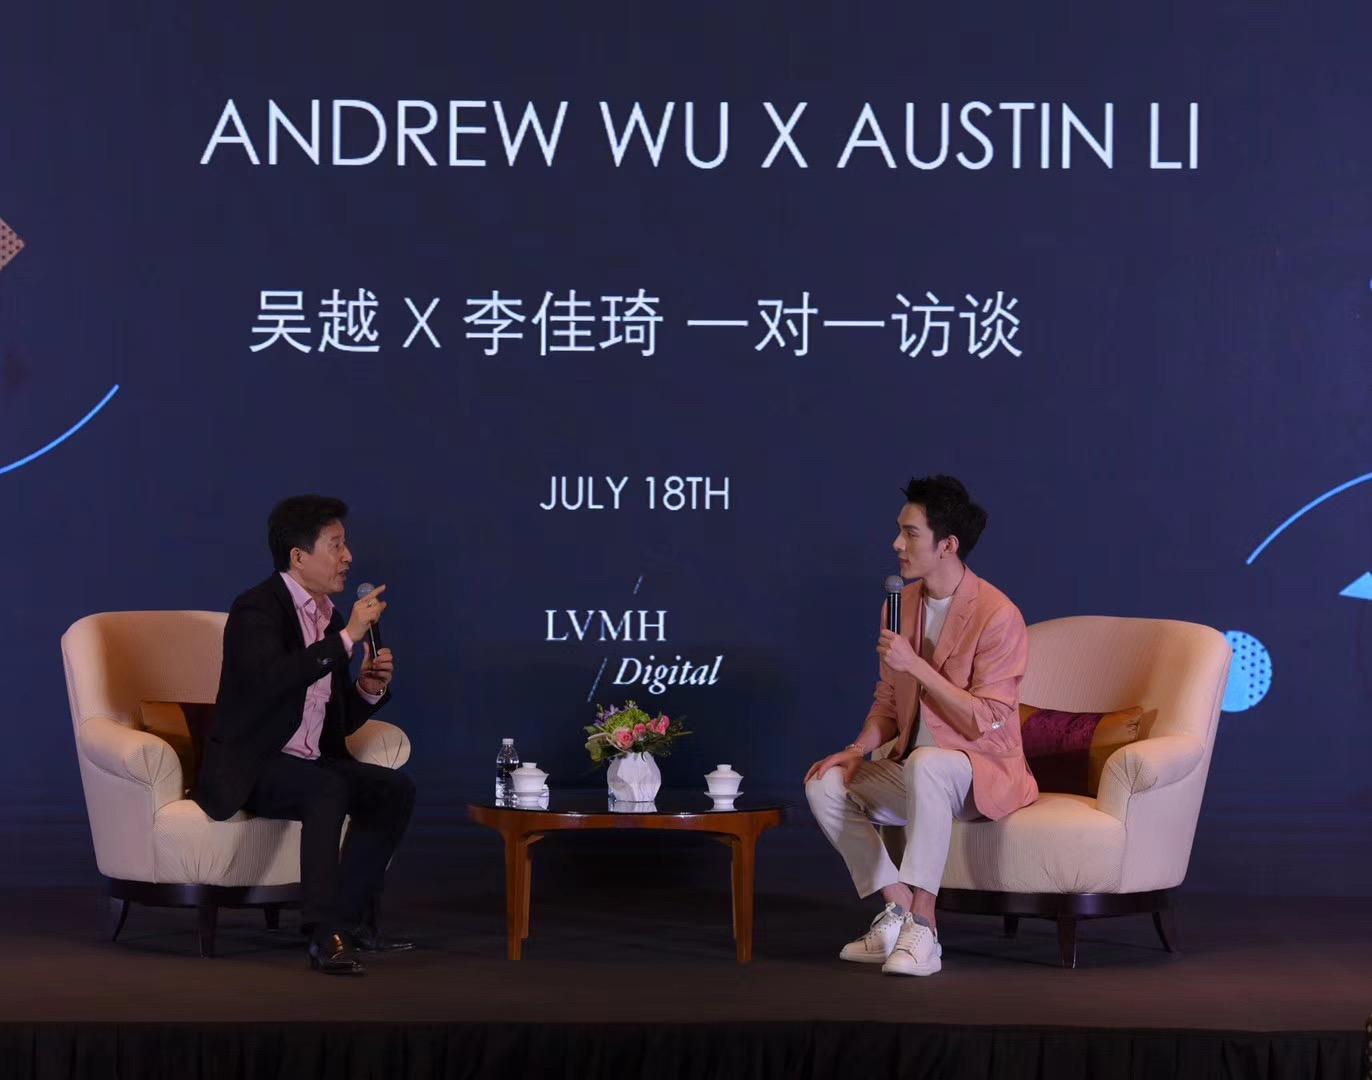 LVMH China CEO Andrew Wu in conversation with TikTok beauty influencer Austin Li